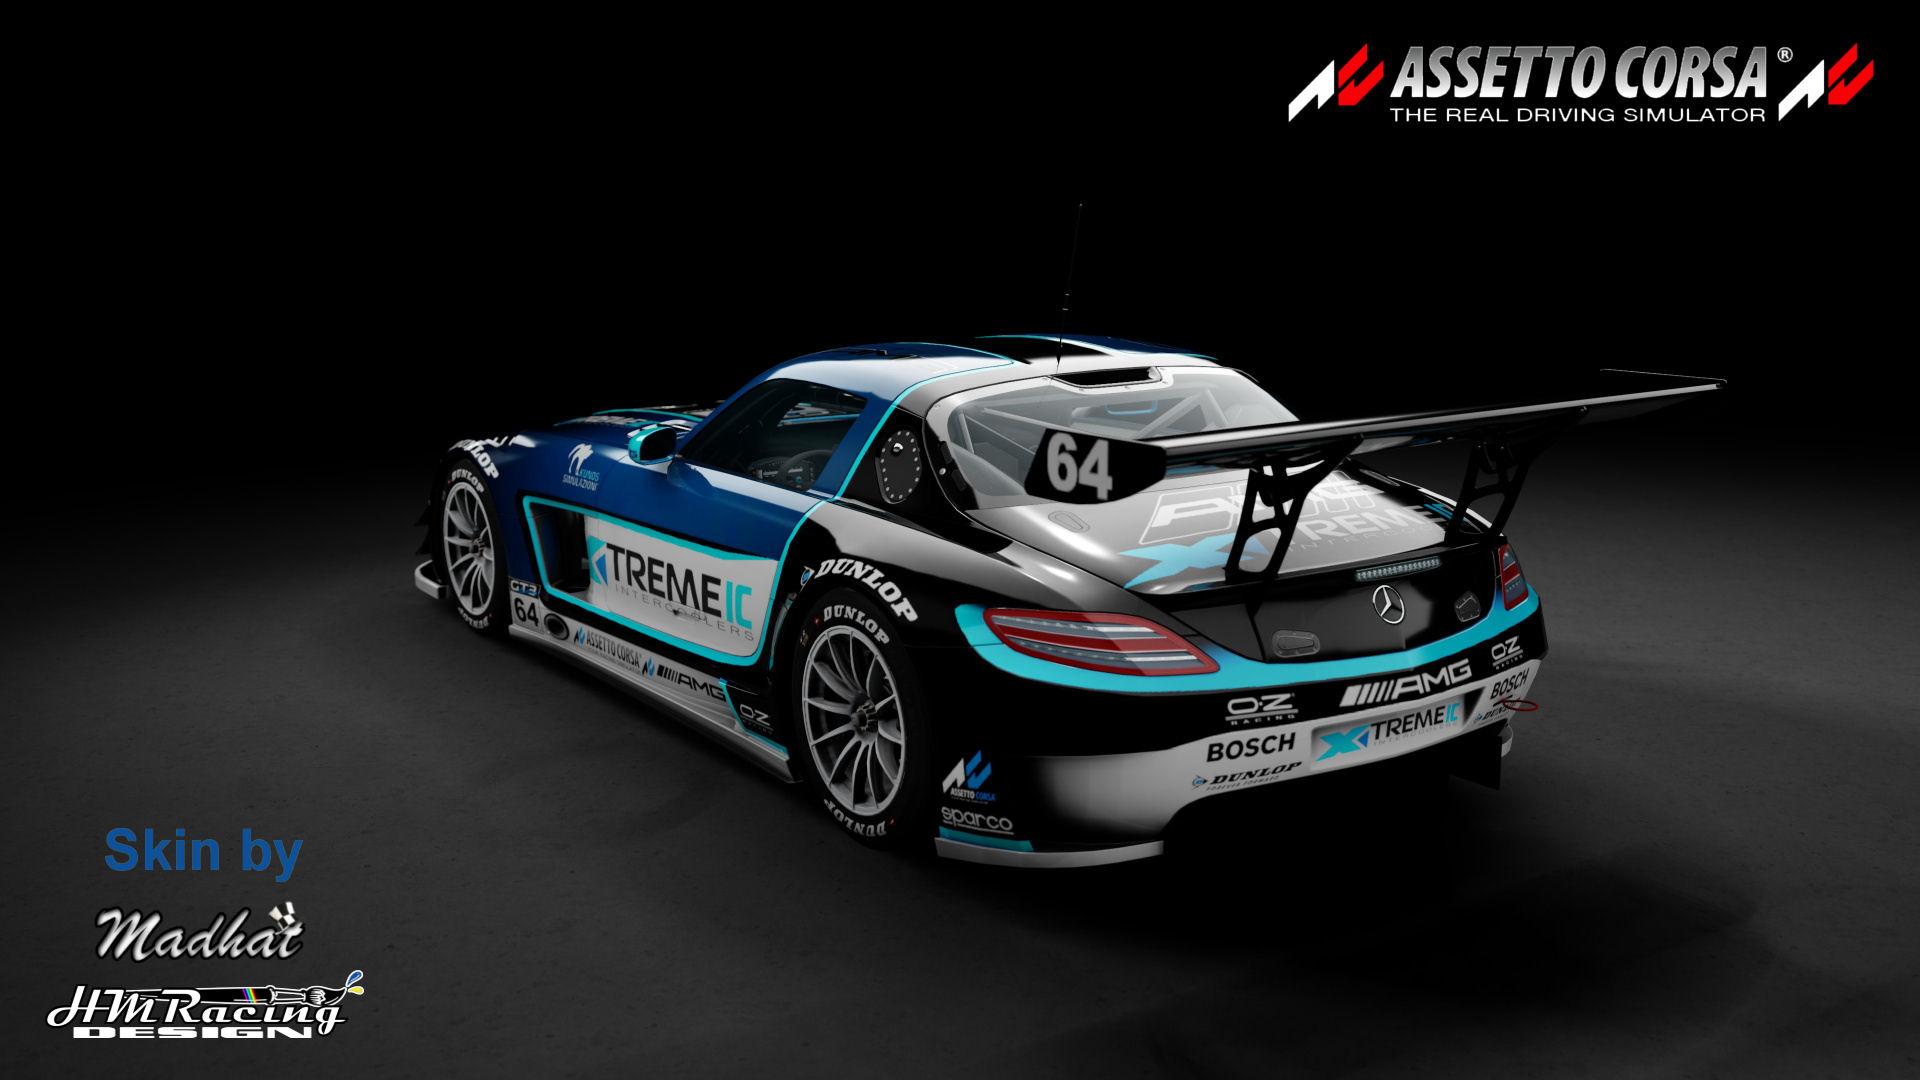 Mercedes SLS GT3 Xtremeic blue fade 04.jpg